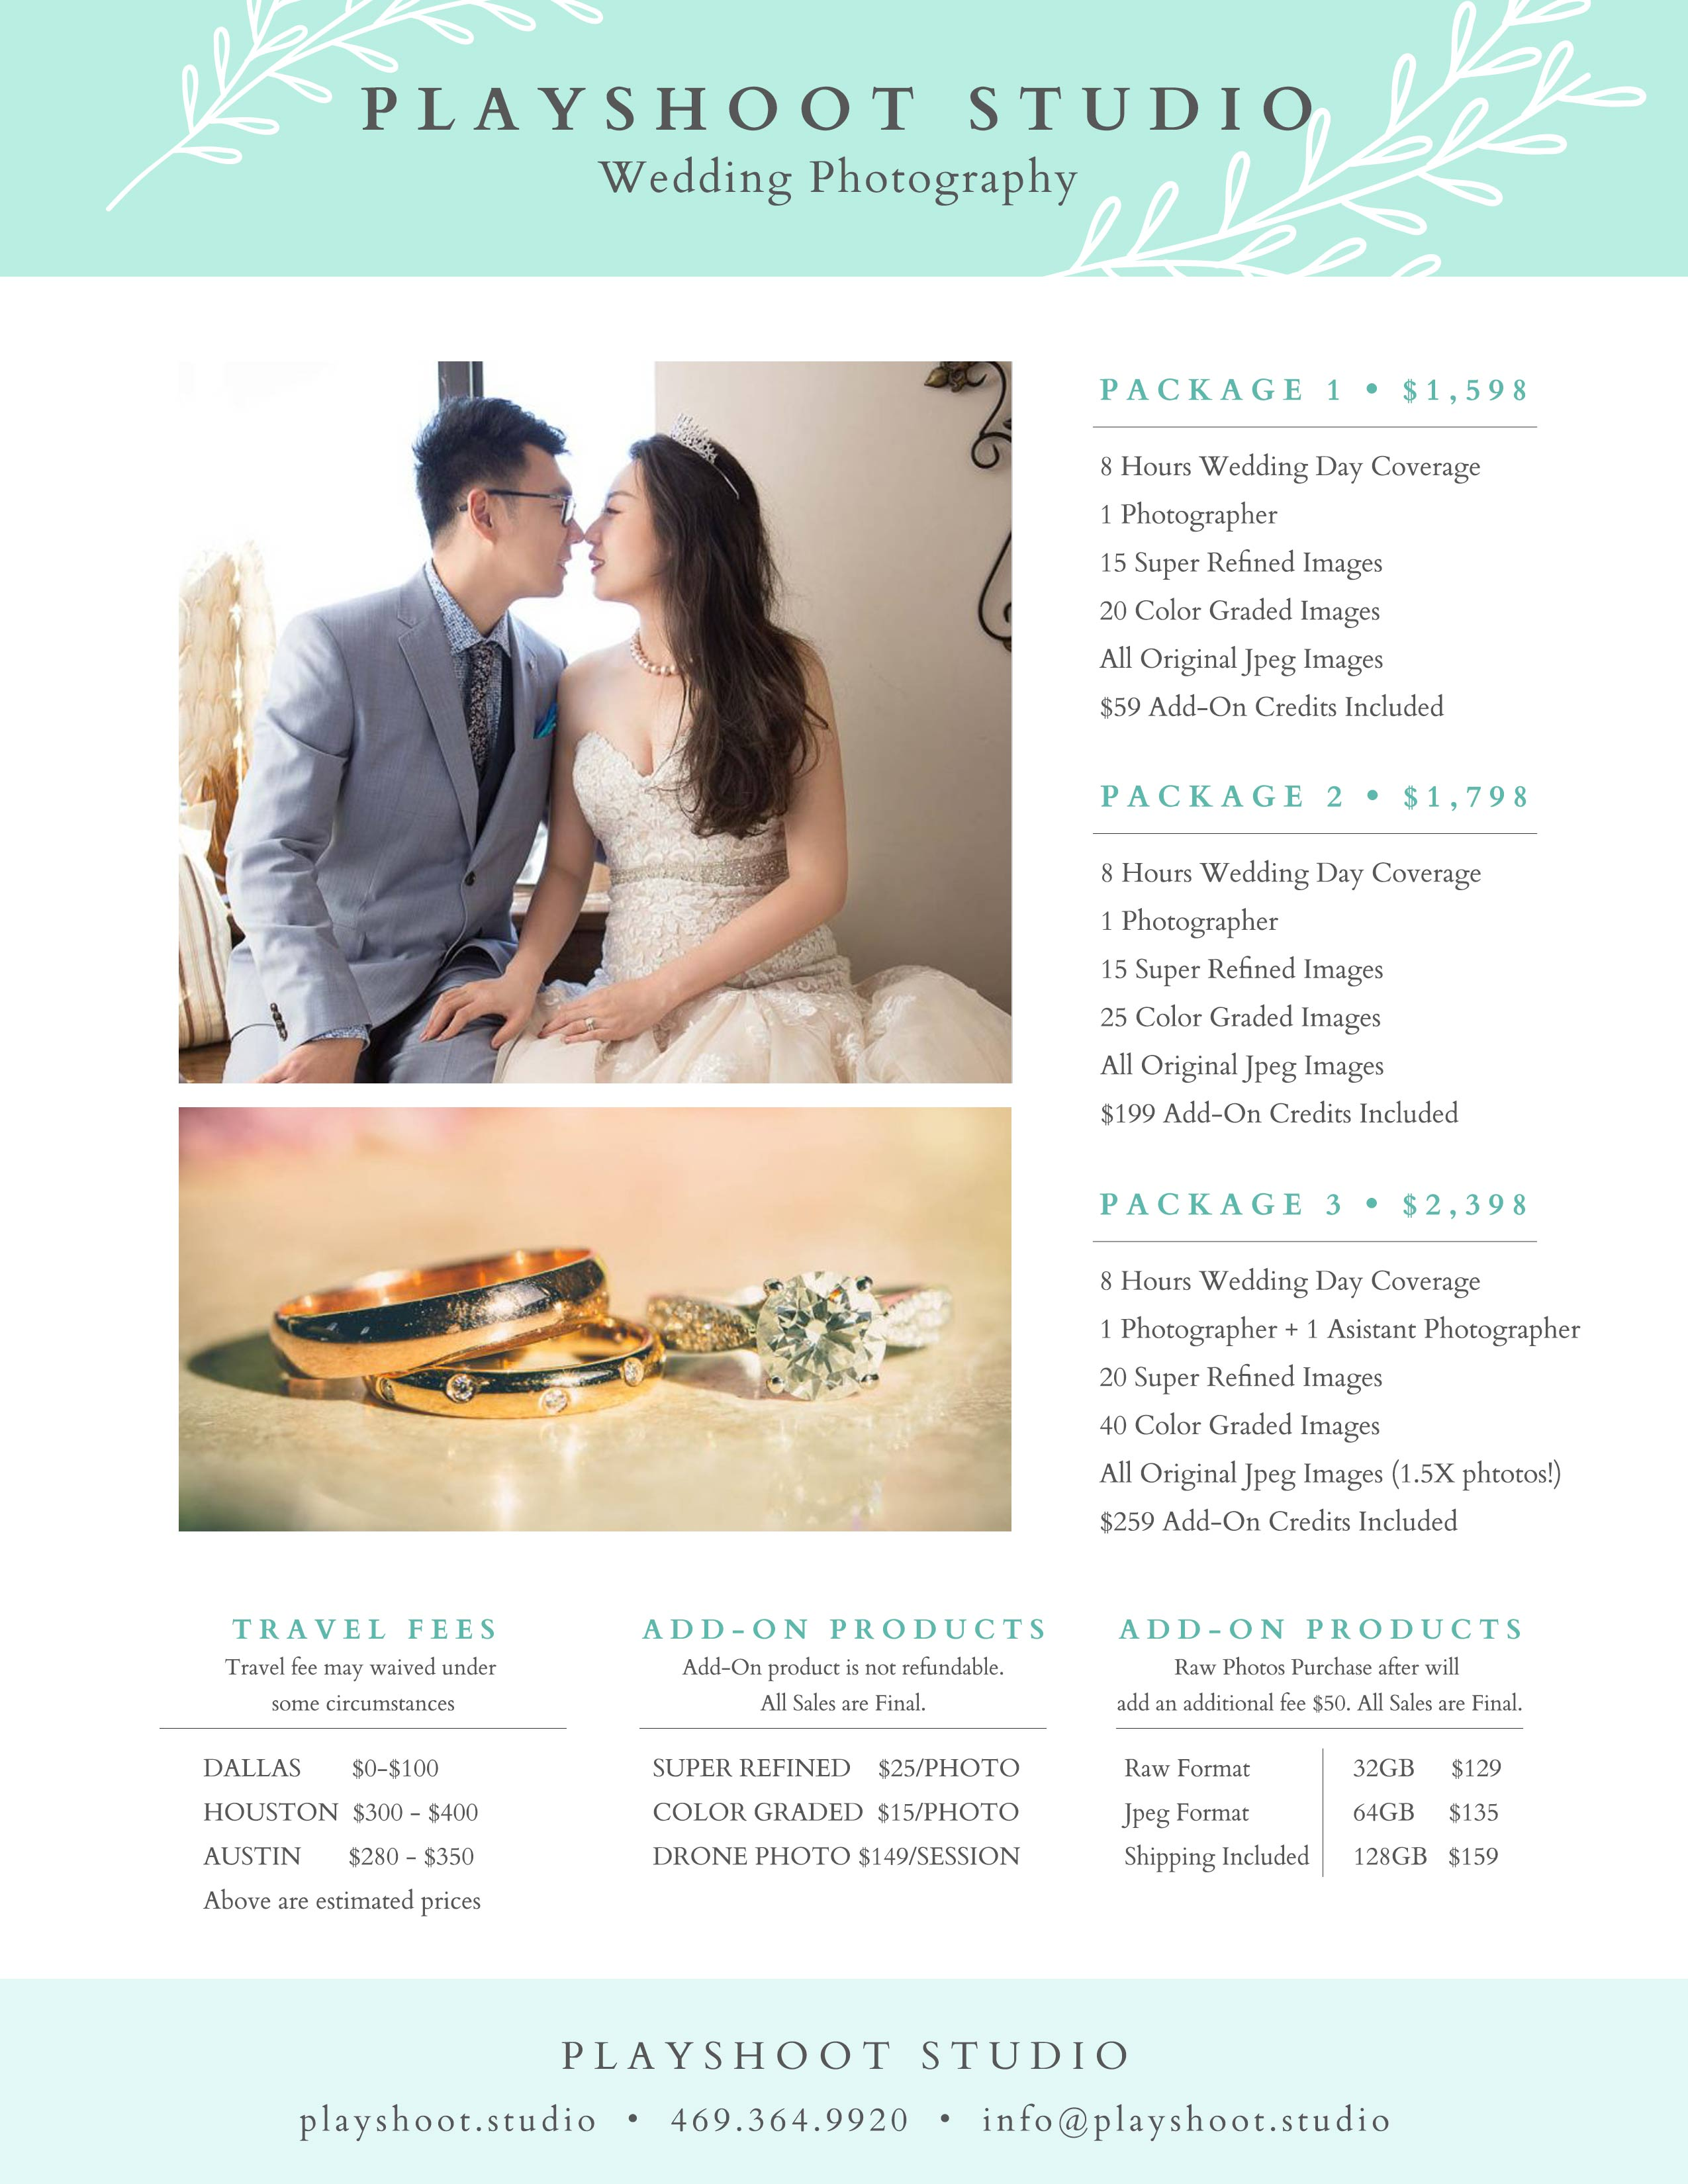 Wedding-Phtography-PlayShoot Studio Pricing 2020